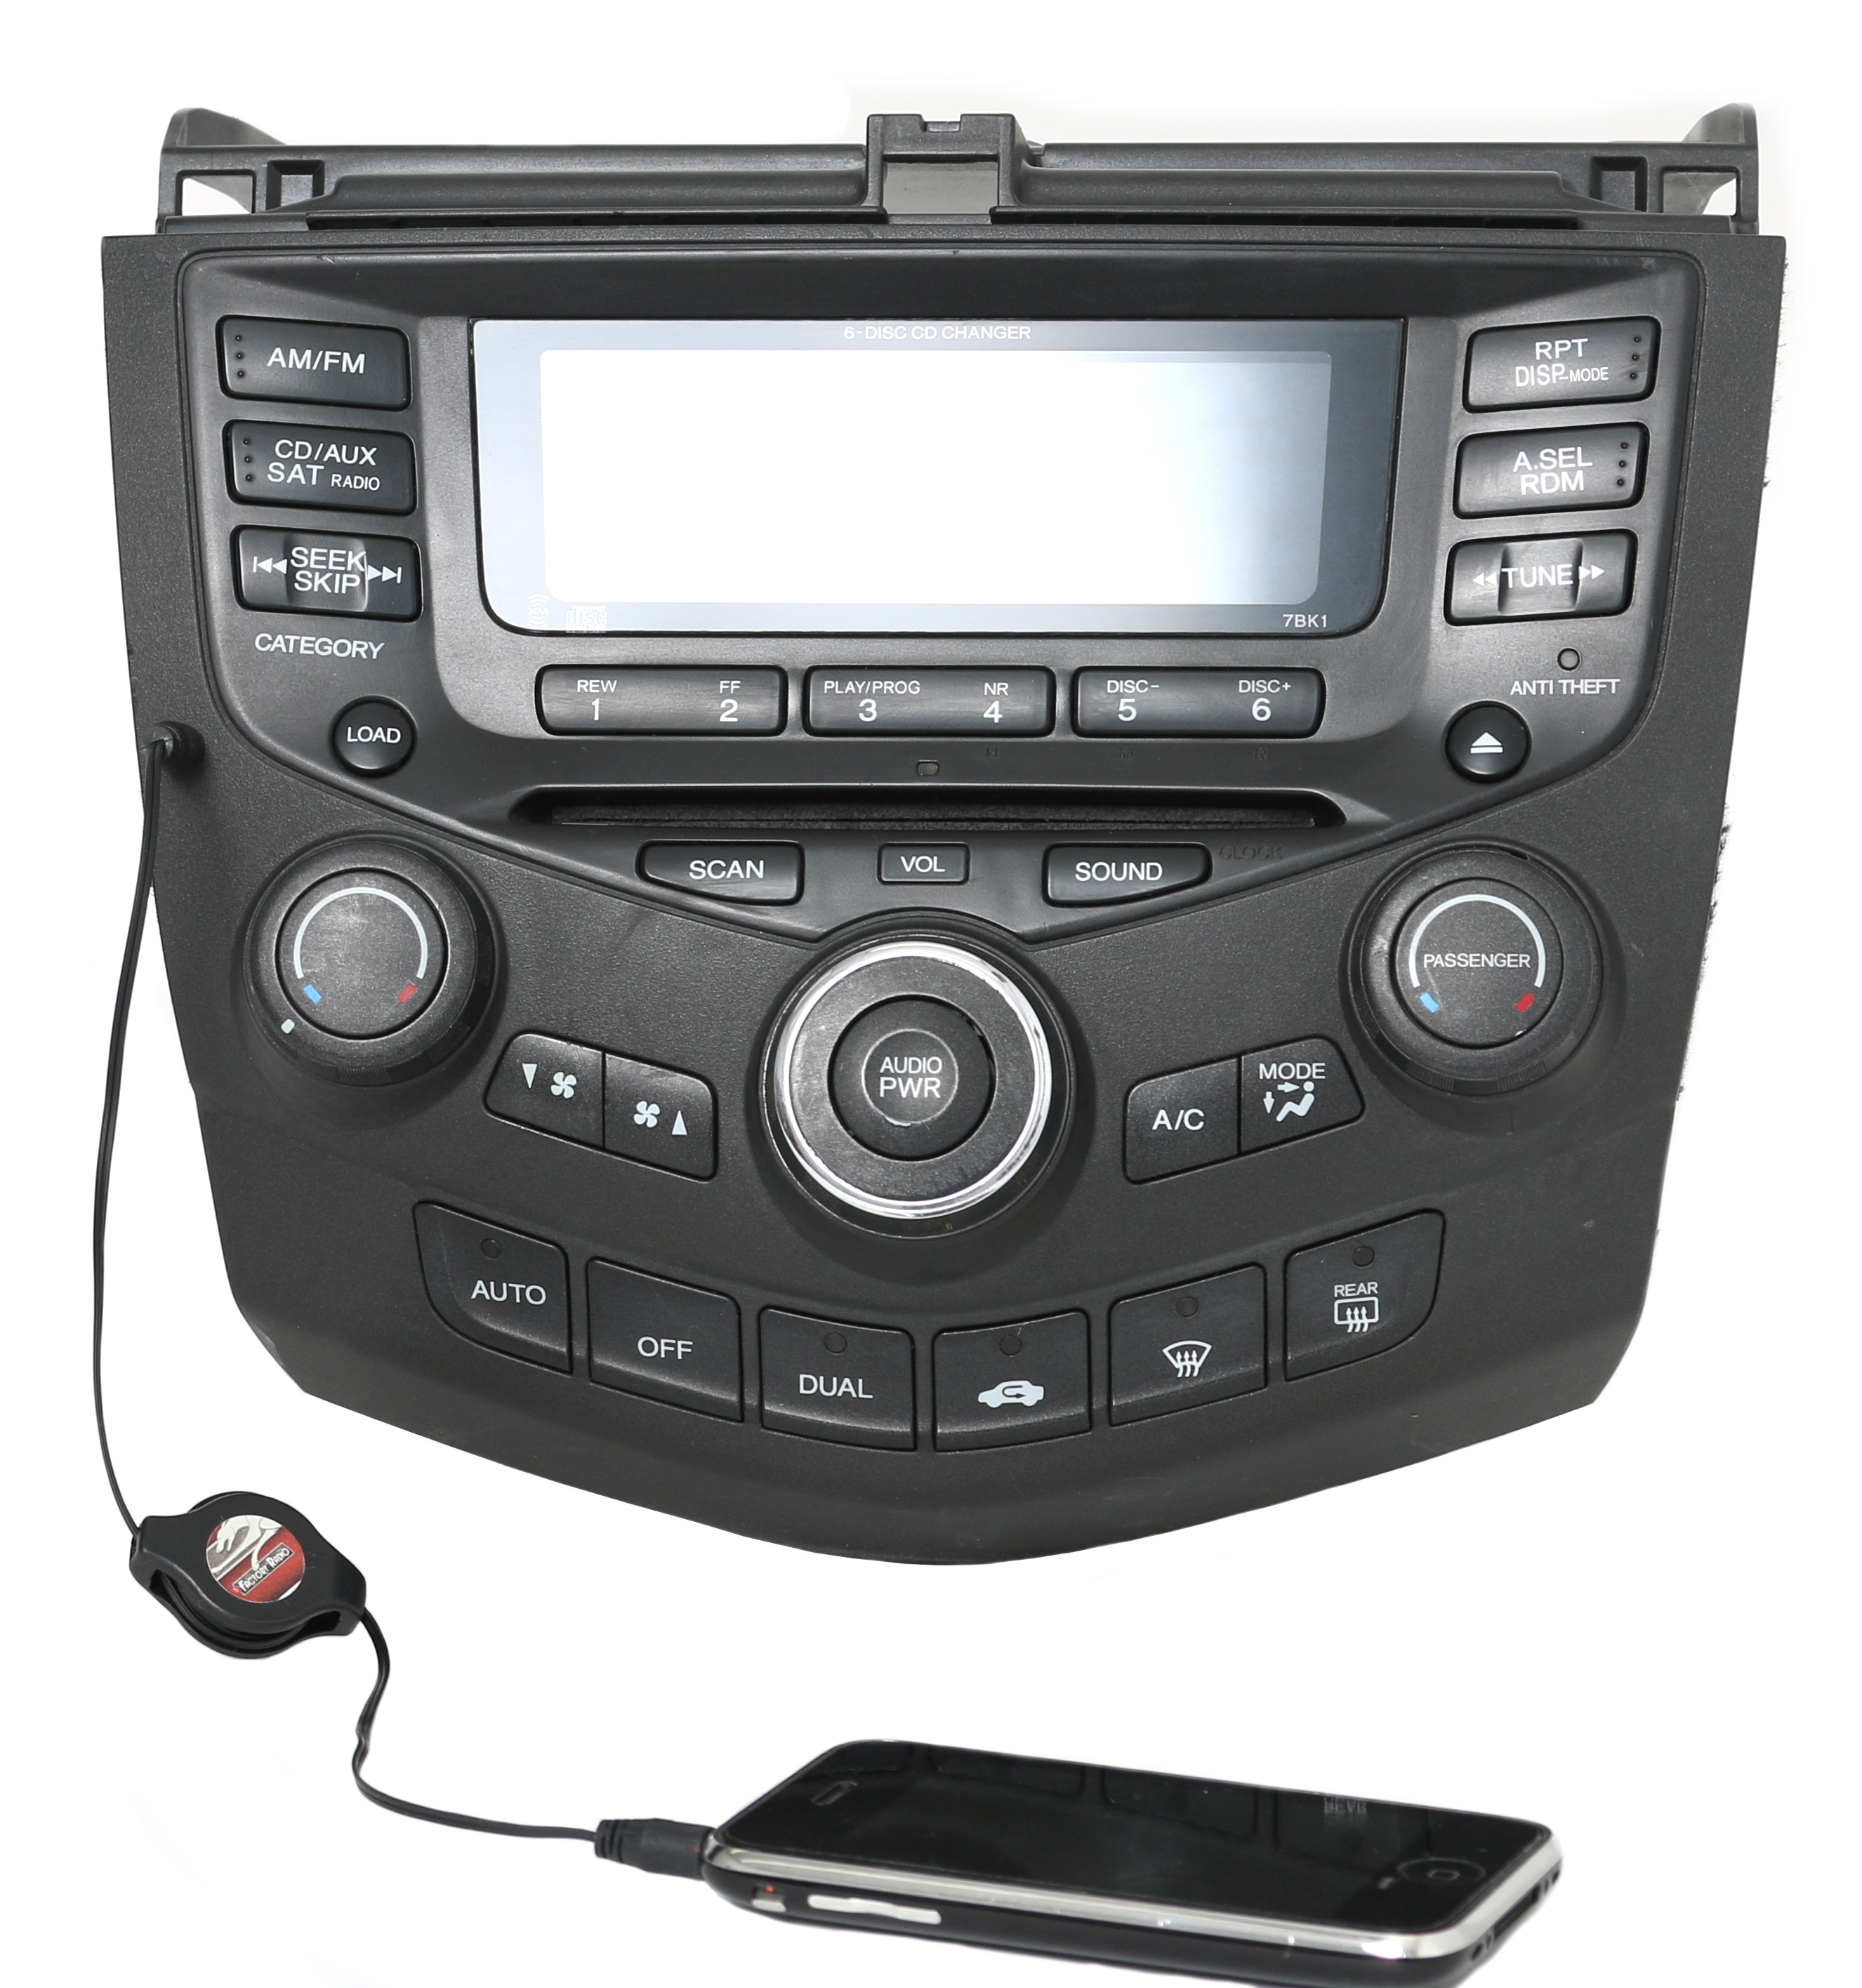 Reman and Aux Mod SERVICE for 04-07 Honda Accord AMFM Radio 6 Disc Temp  Controls - 1 Factory Radio